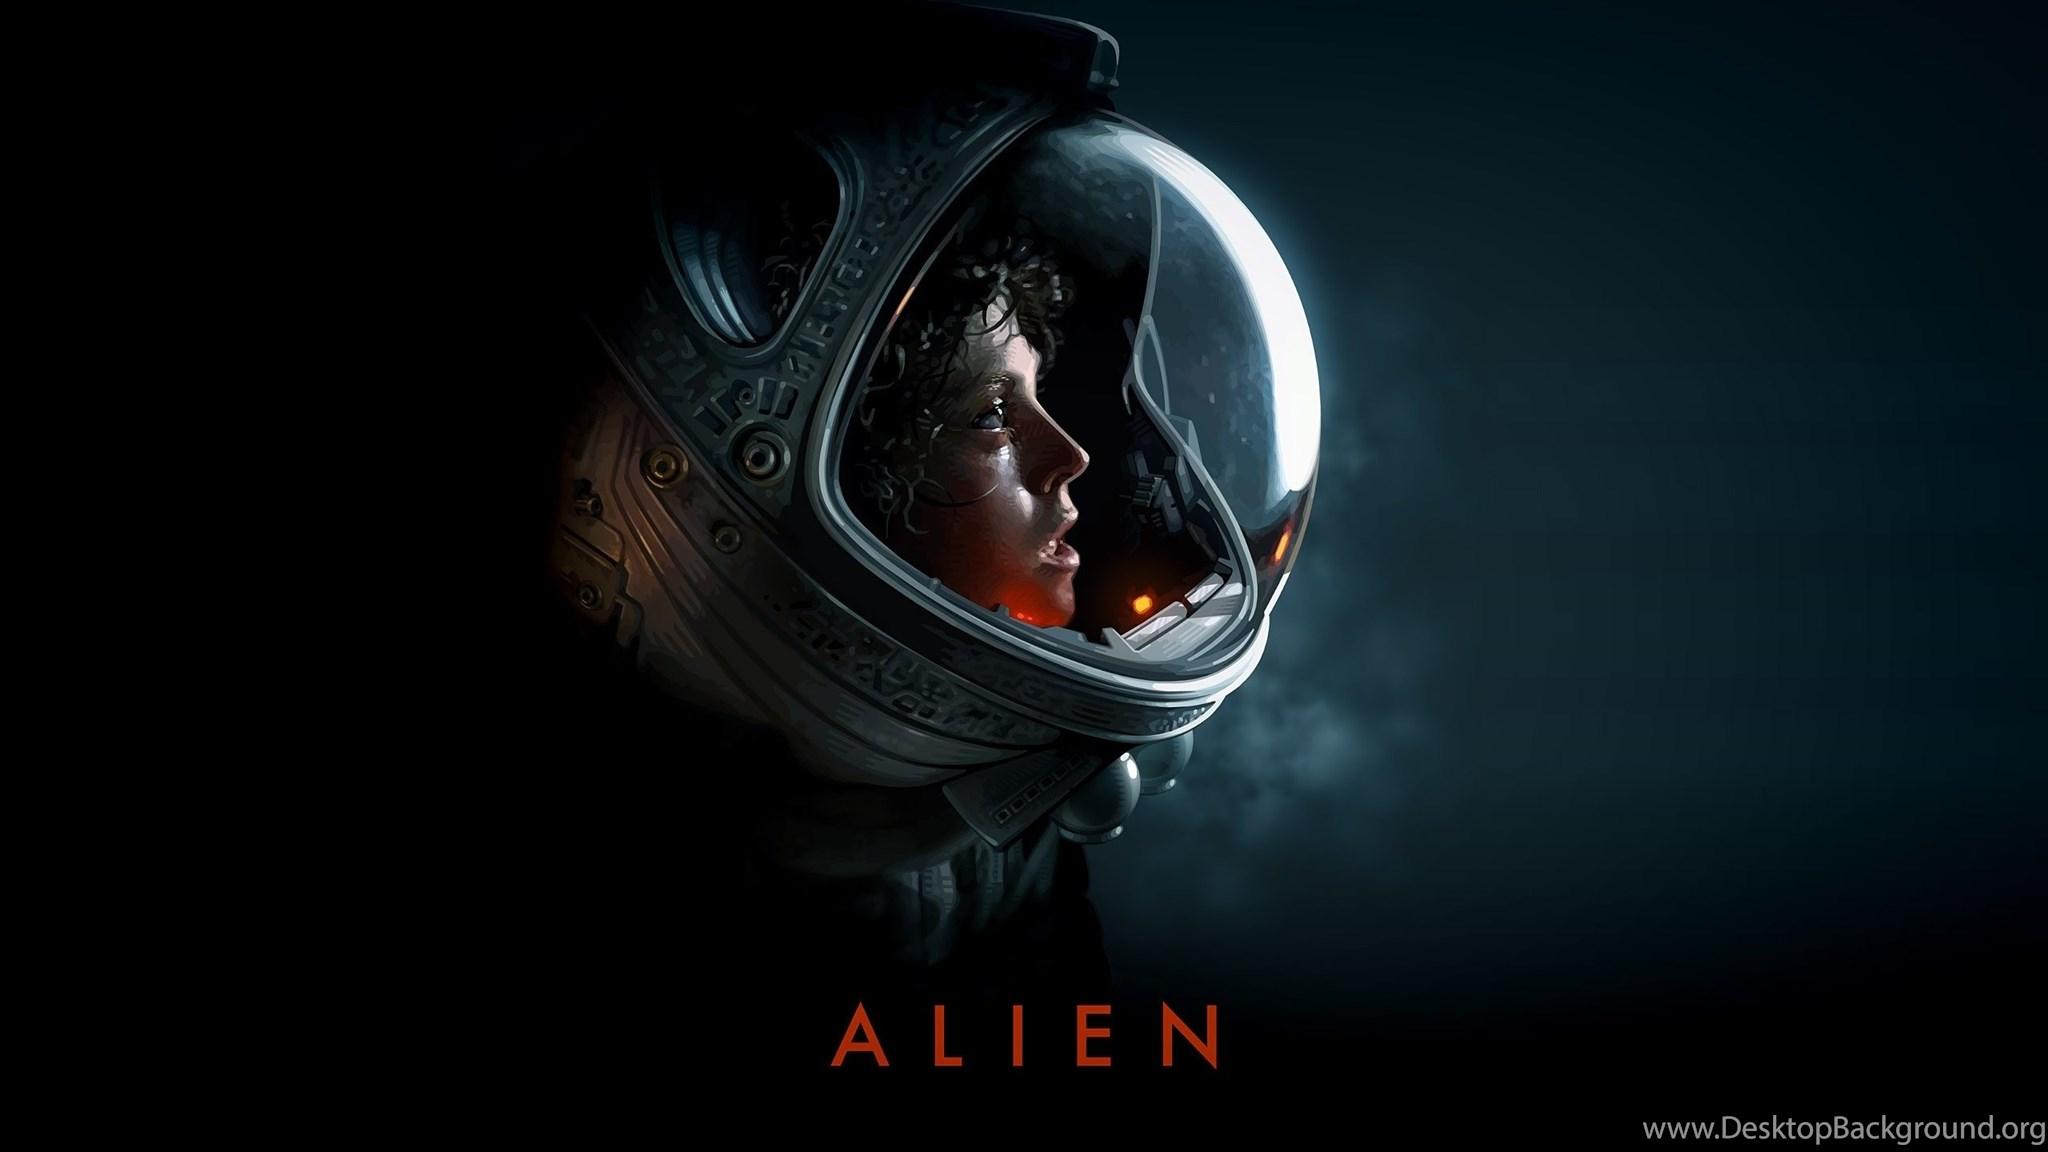 Tag Aliens Movie Live Wallpapers Wallpaper Hd Desktop Background